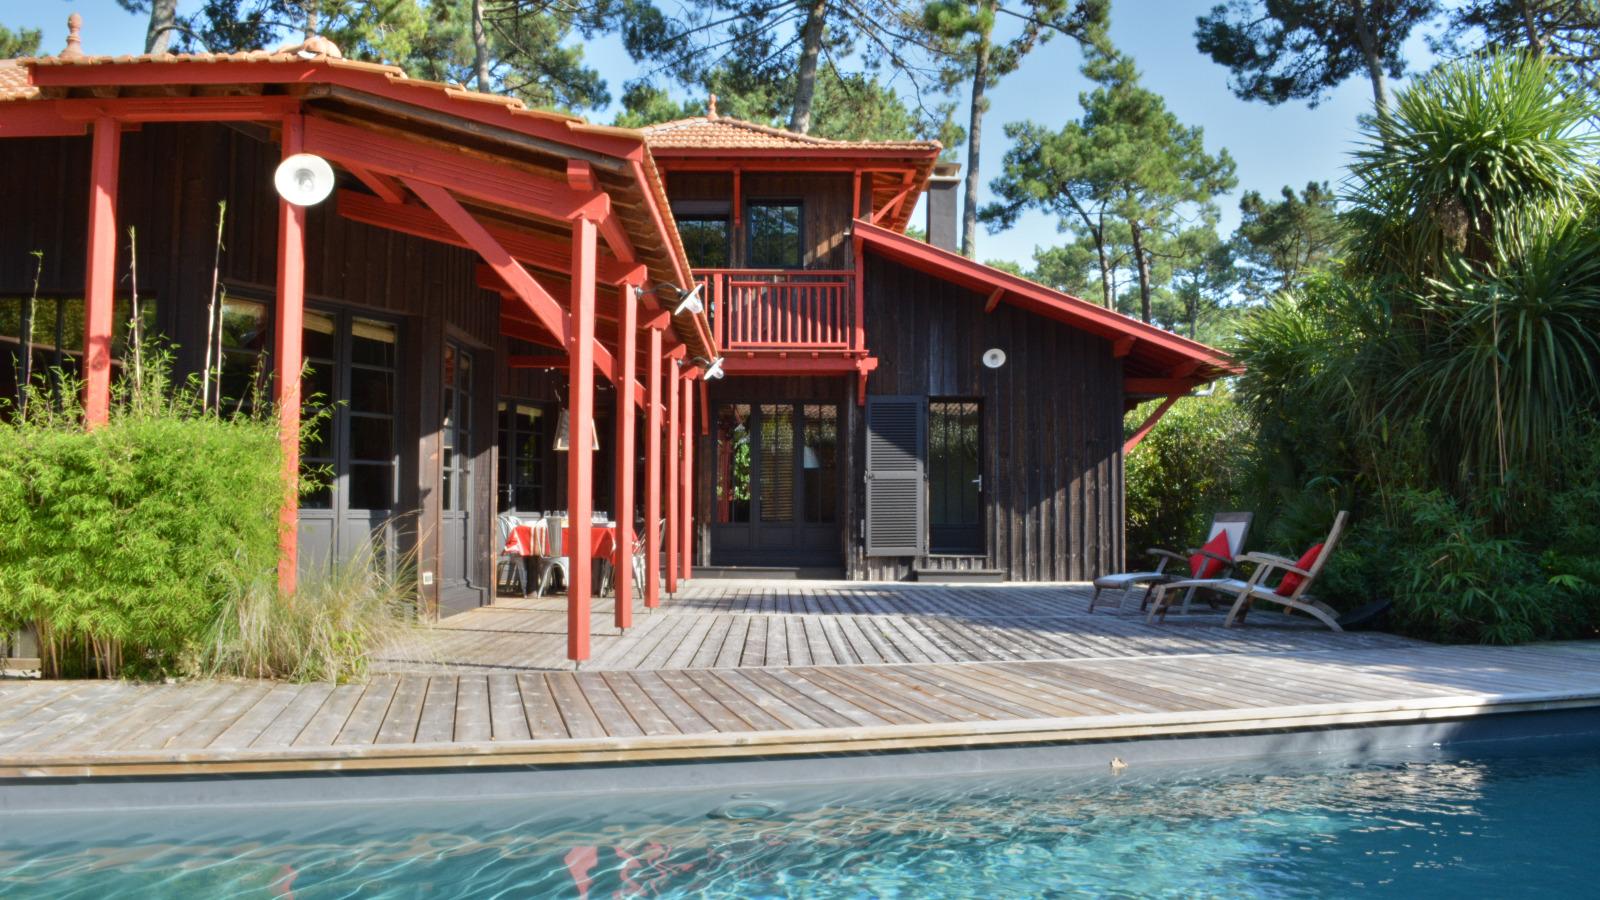 location maison cap ferret avec piscine ventana blog. Black Bedroom Furniture Sets. Home Design Ideas